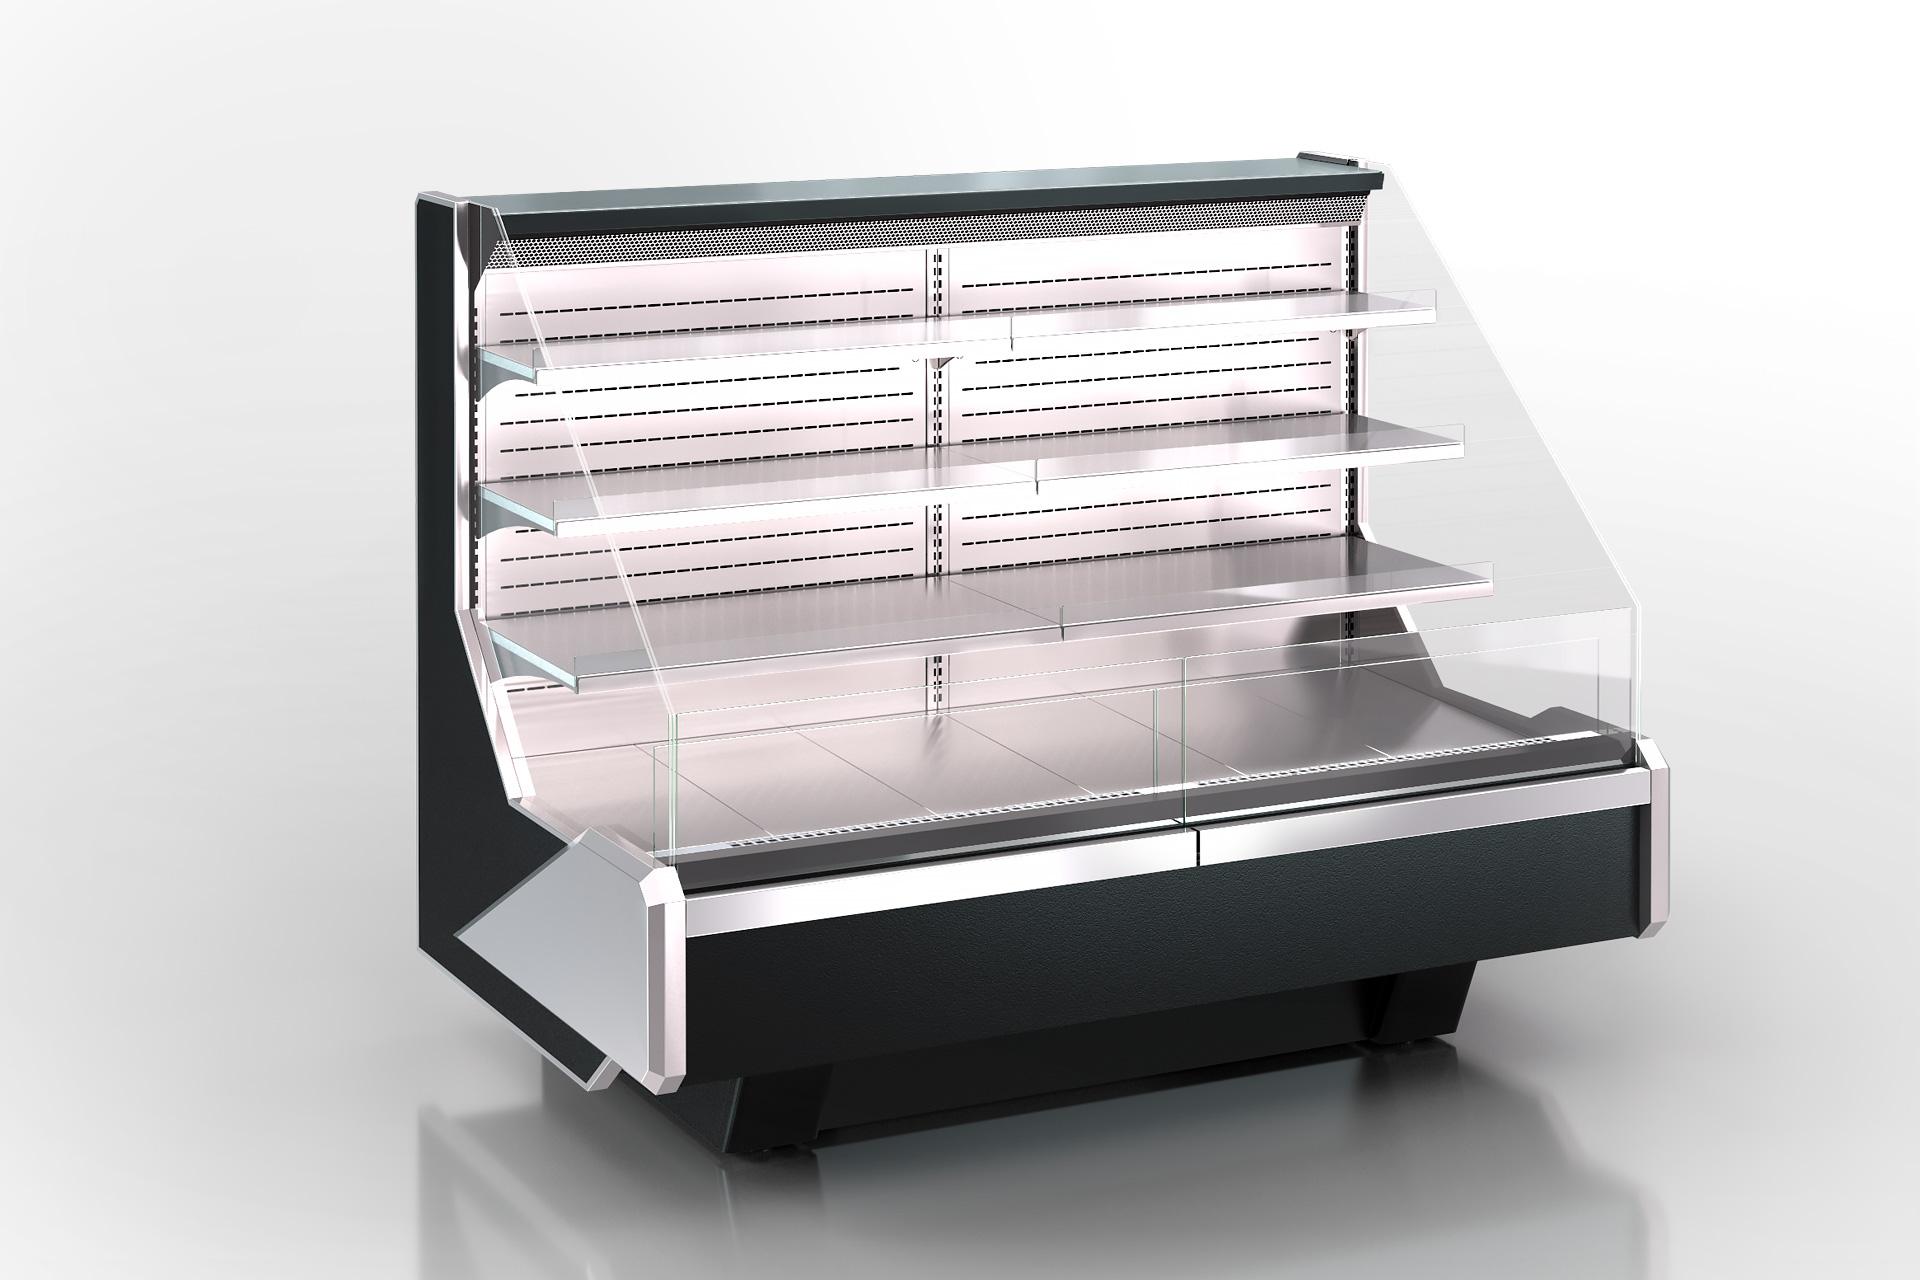 Холодильная витрина Missouri Enigma MC 120 cascade self 160-DBM